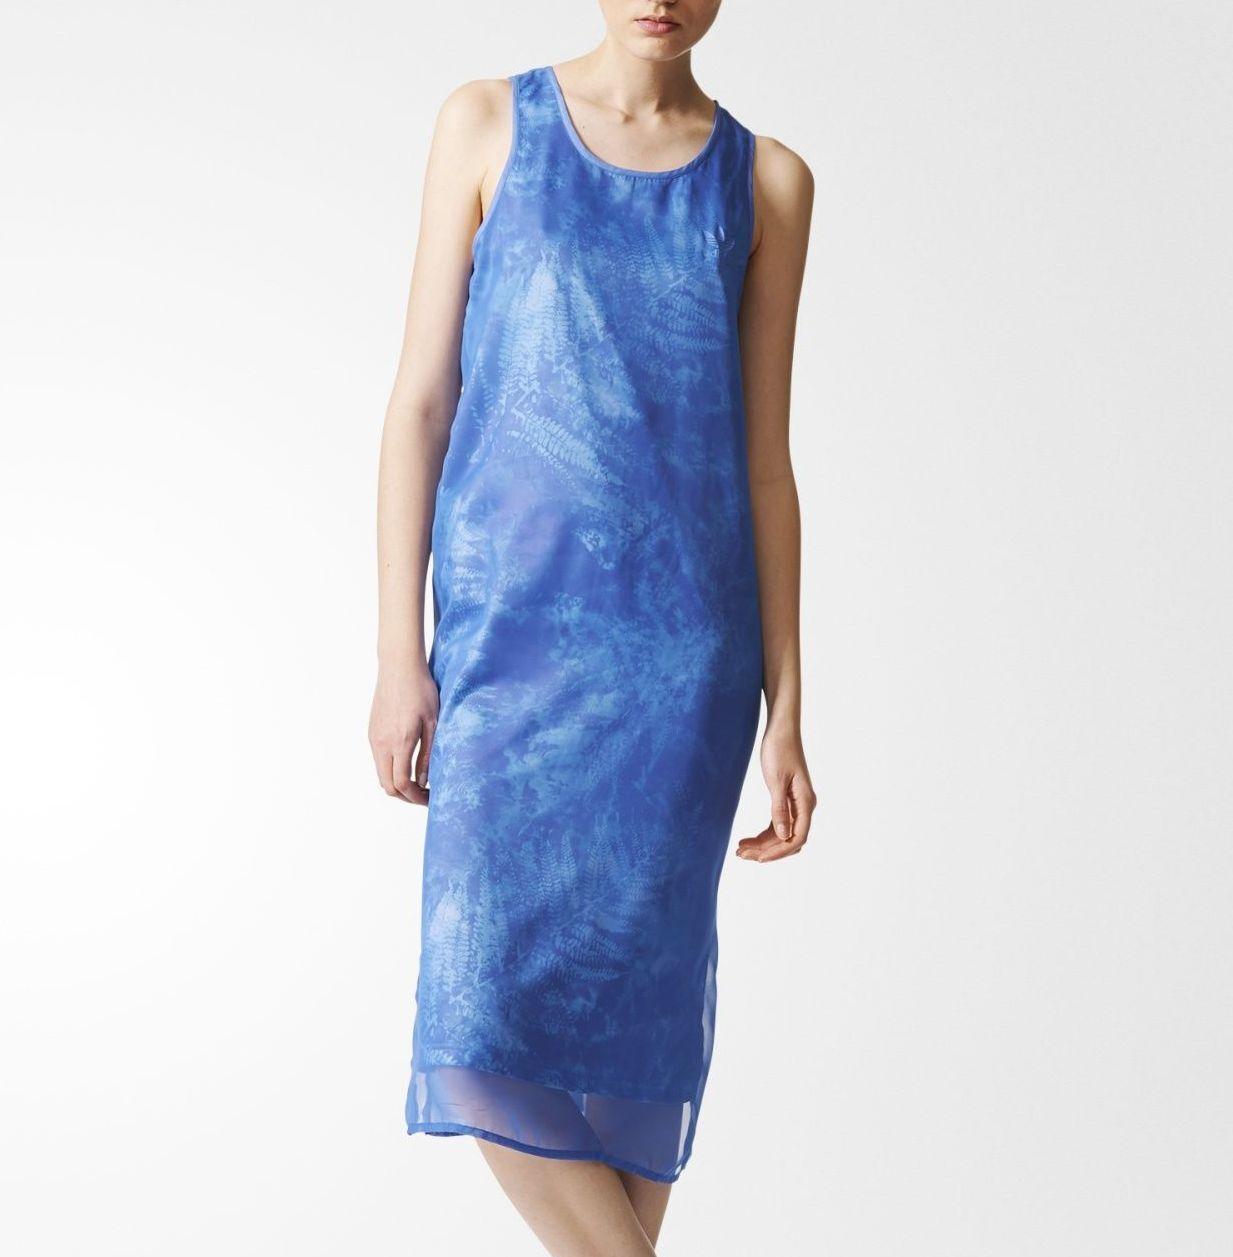 "Adidas ΠρωΟ""ΟŒΟ""υπα ΓυναικΡία φορέματα θαλάσσιων στοιχΡίων Ο†ΟŒΟΞ΅ΞΌΞ± Tank Blue Blue Satin CF9969"